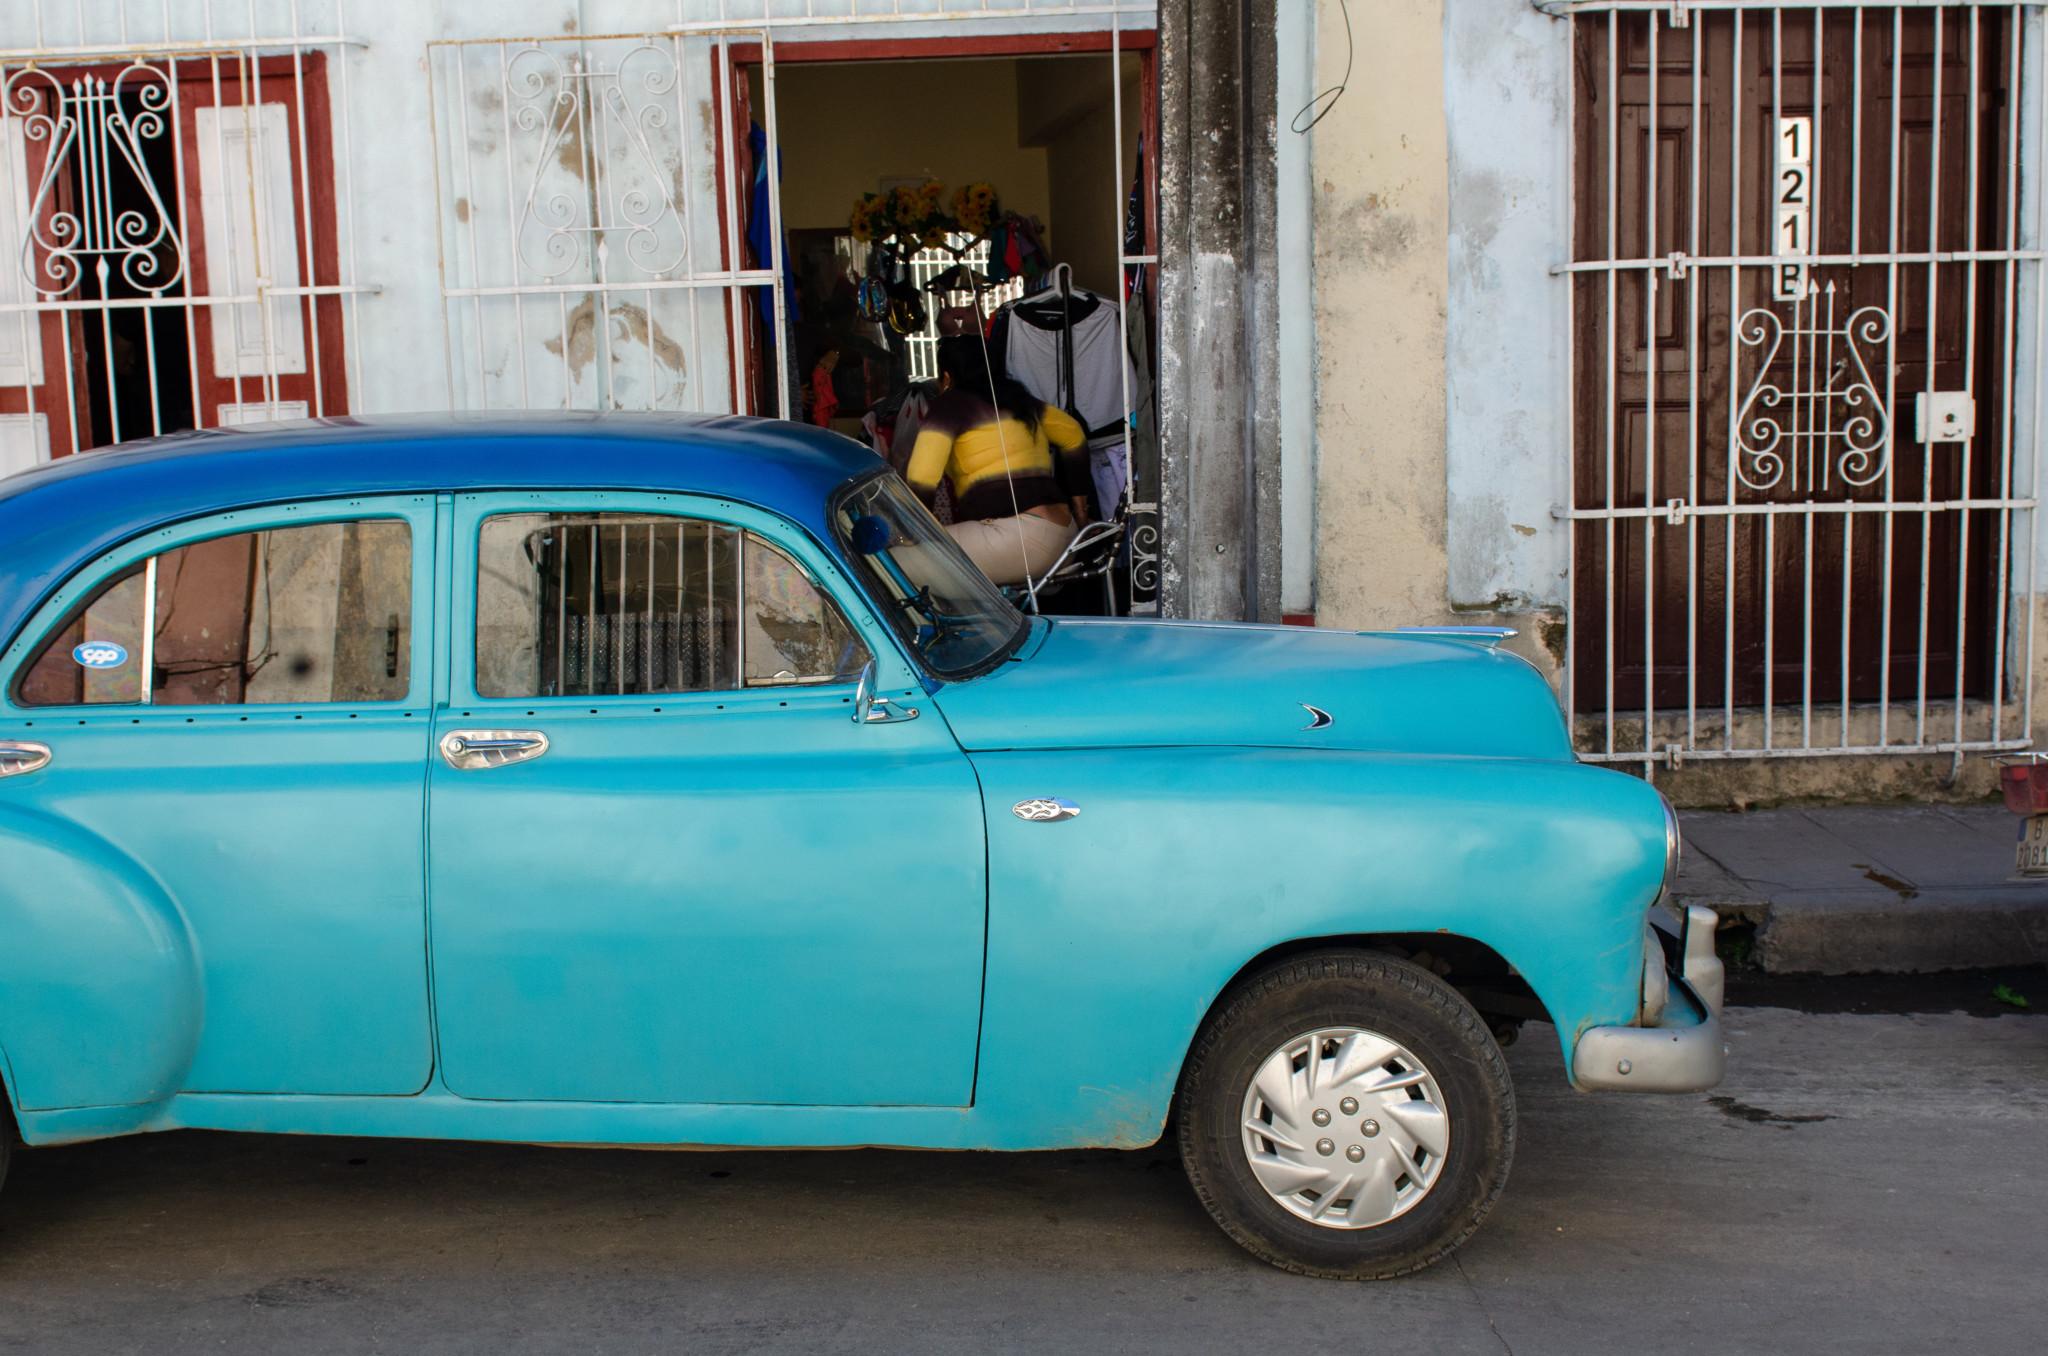 Auch im Kuba heute sieht man alte Oldtimer.